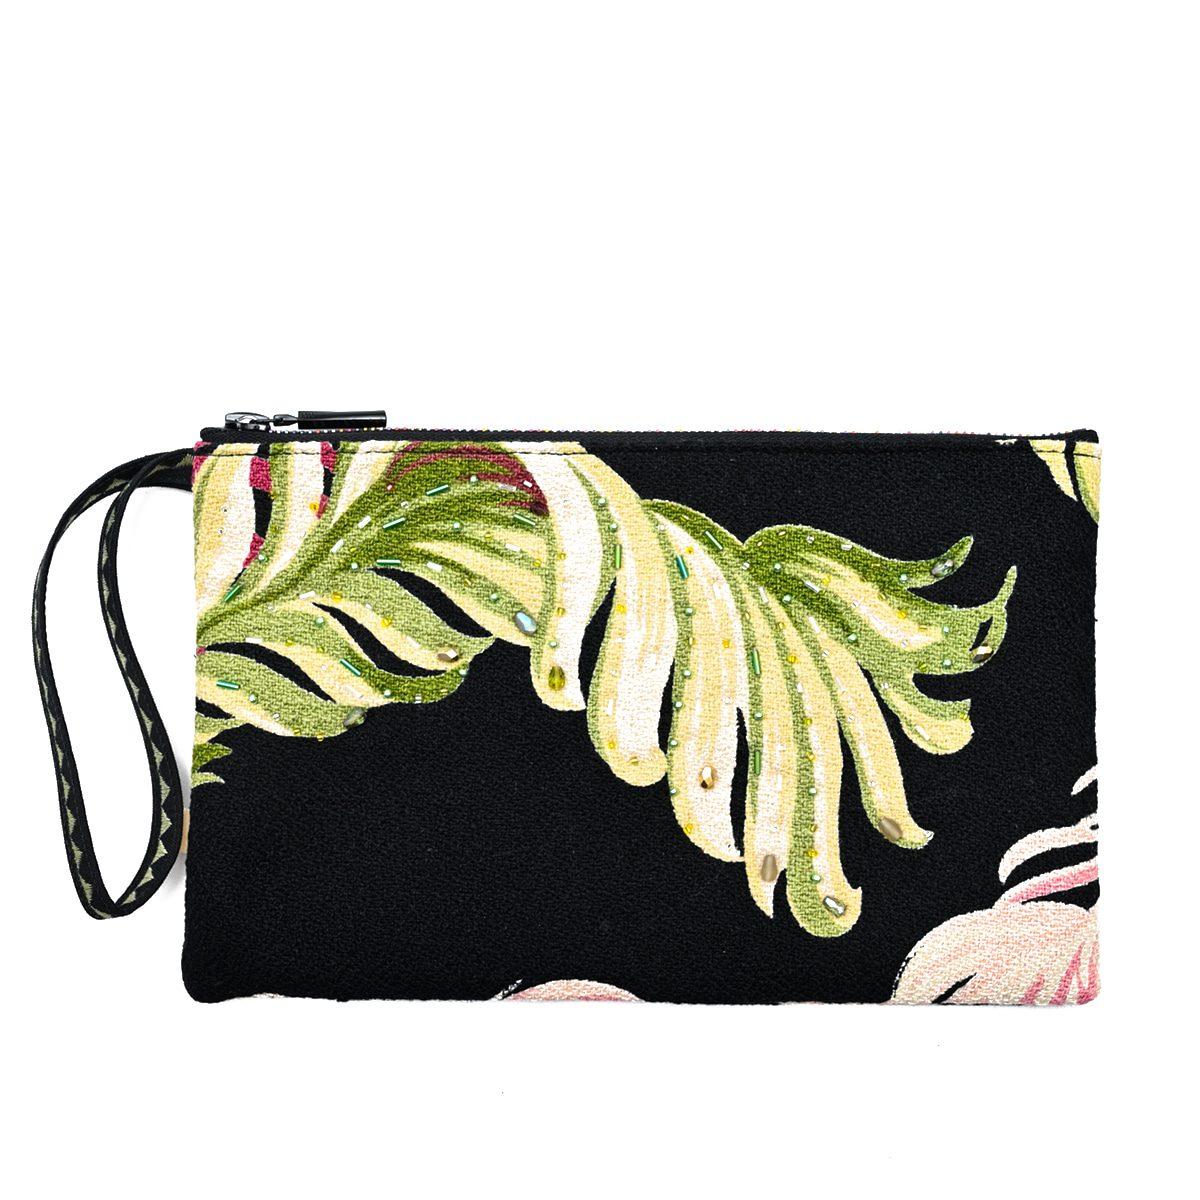 Ferns – Hand-Beaded